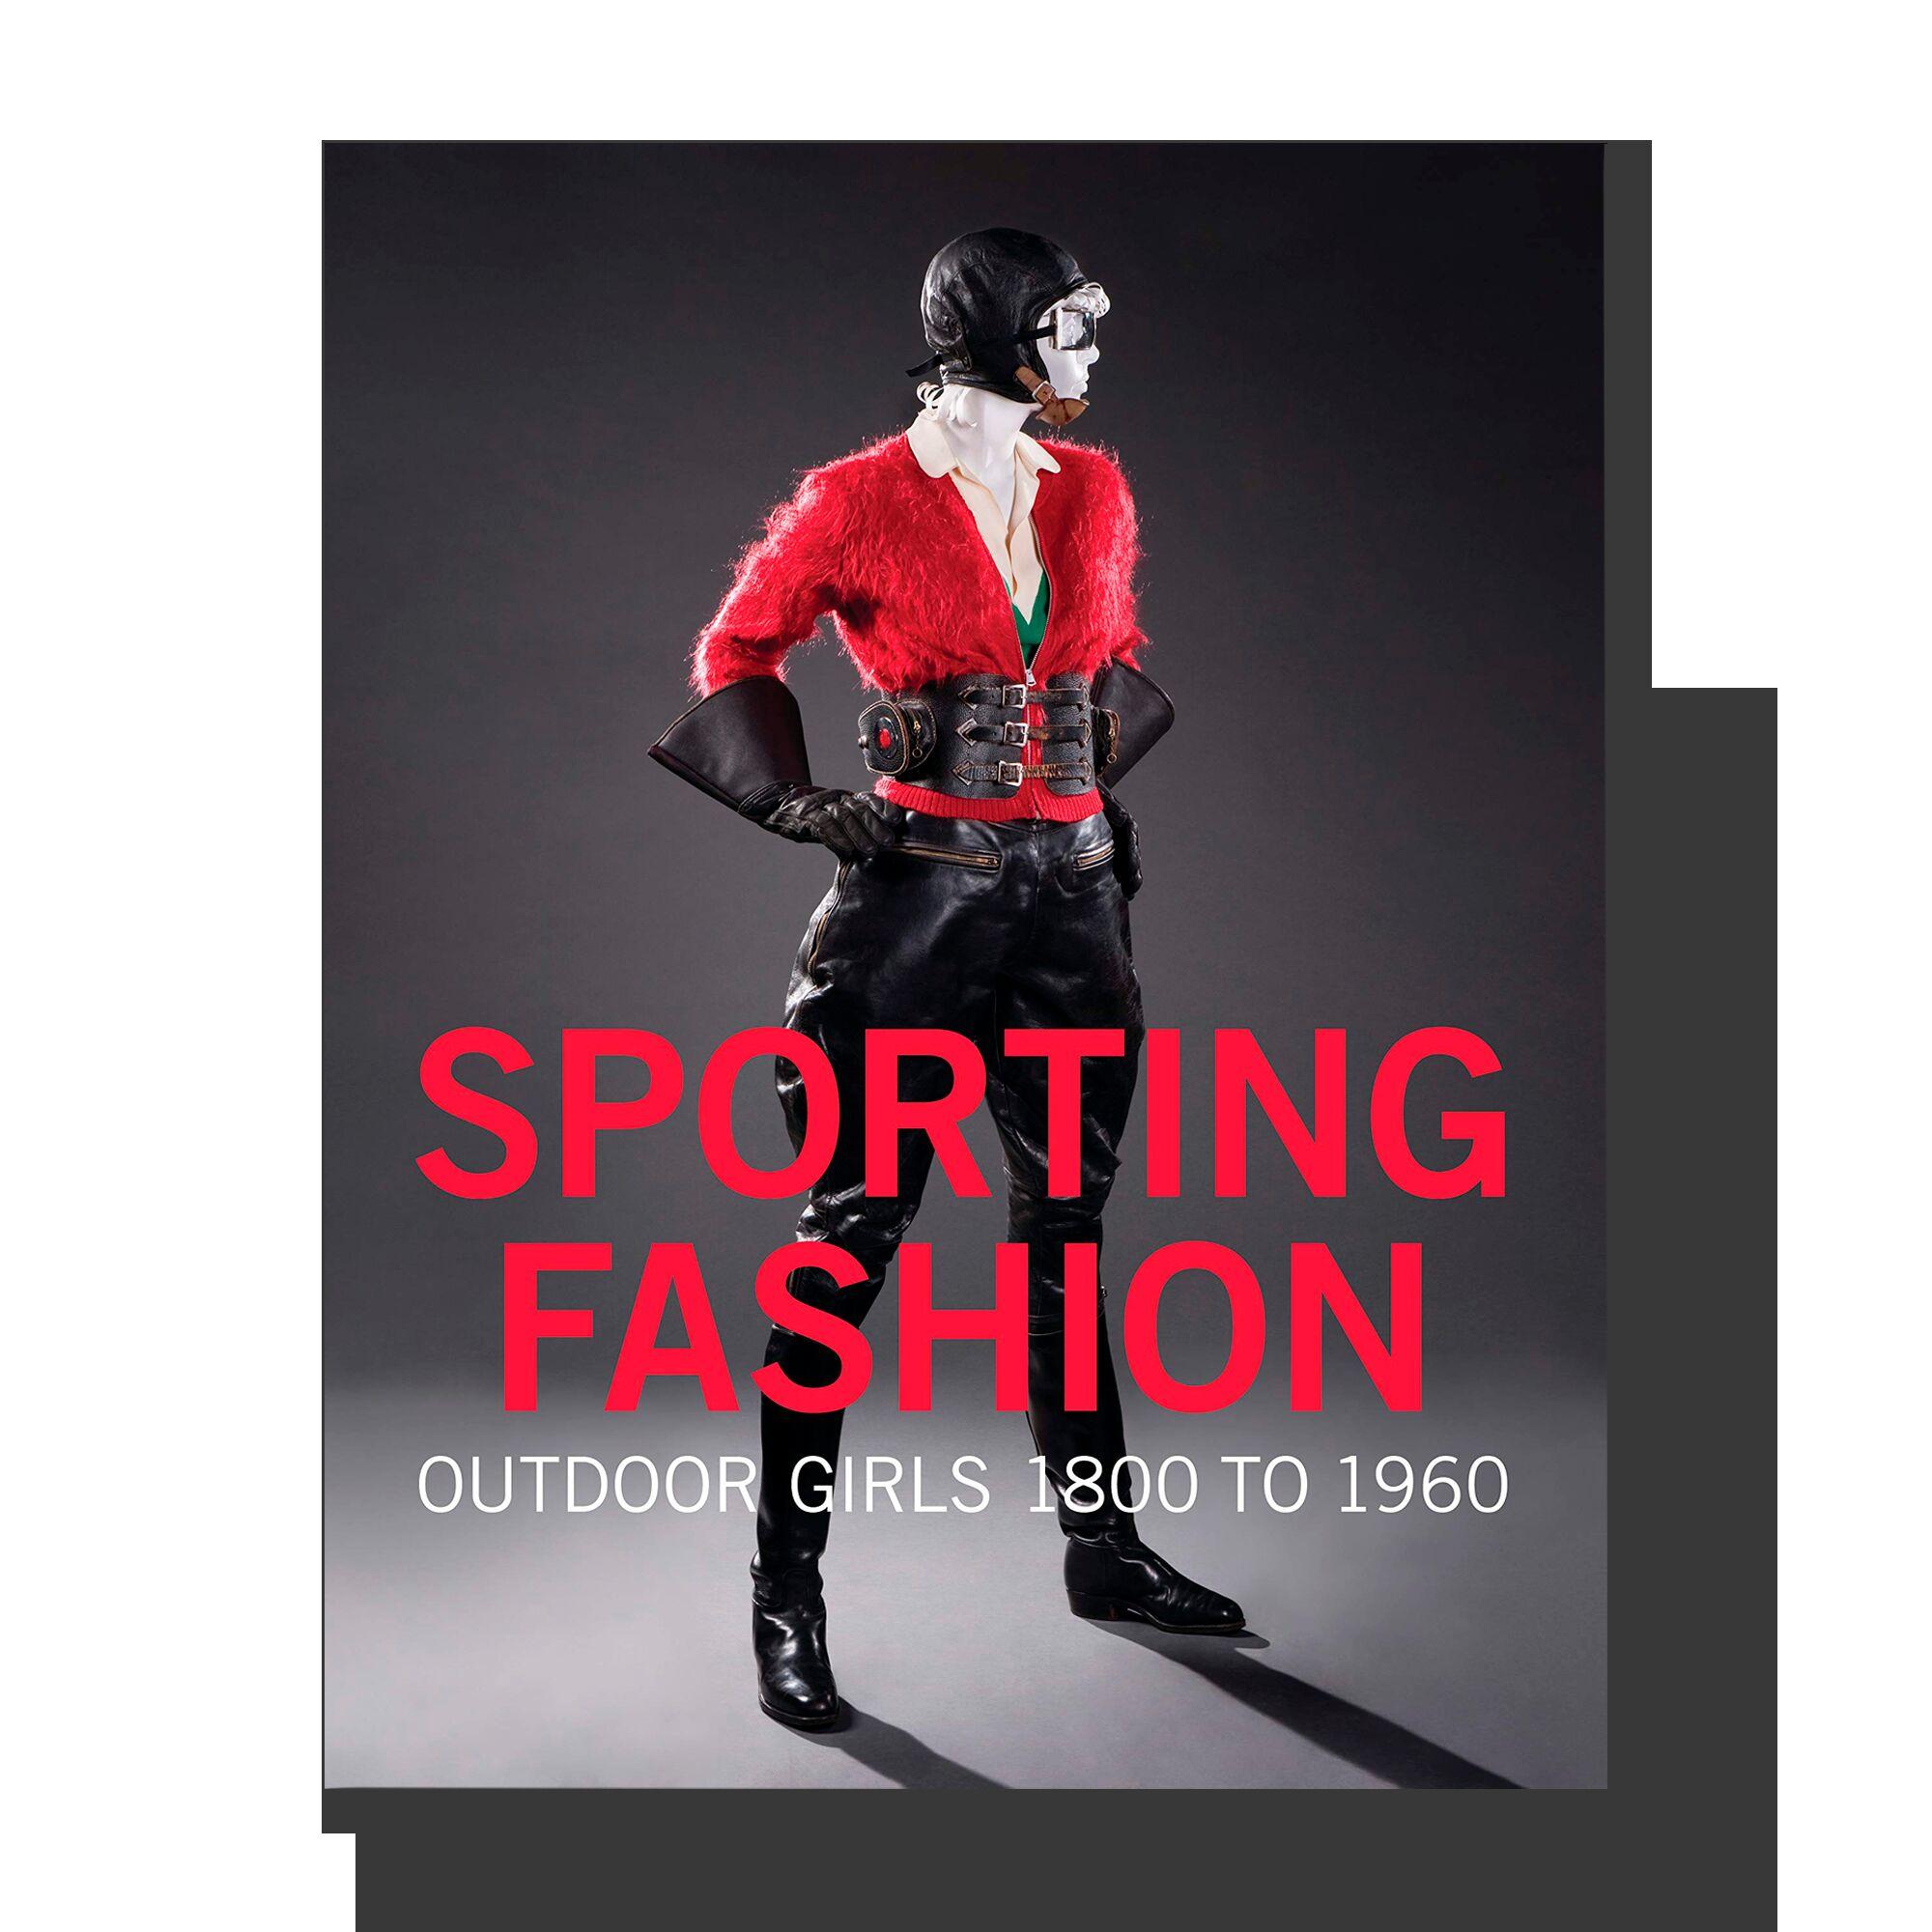 Sporting Fashion: Outdoor Girls 1800 to 1960